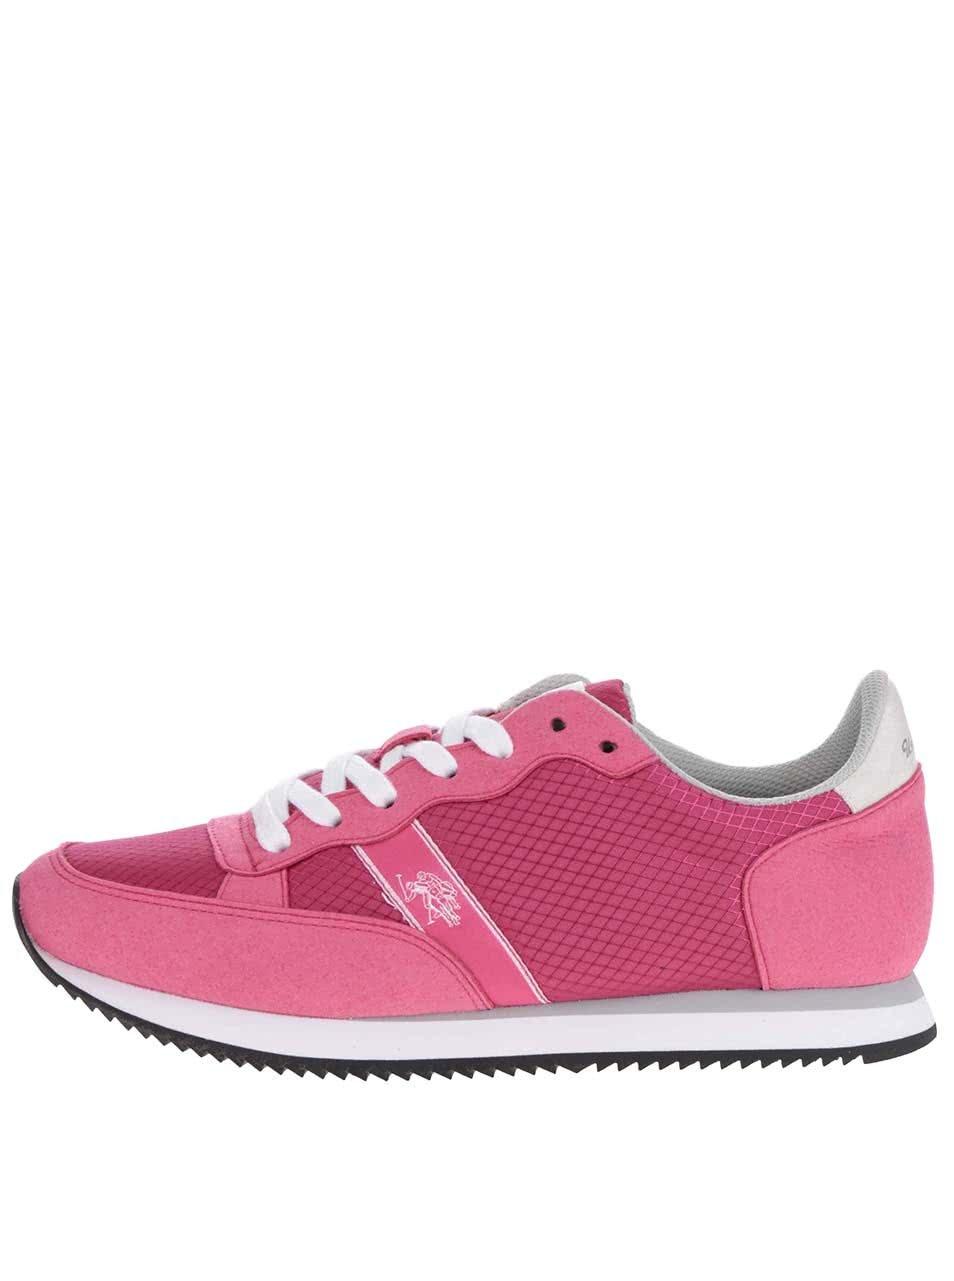 Růžové dámské tenisky U.S. Polo Assn. Rasty ... 4113635d30